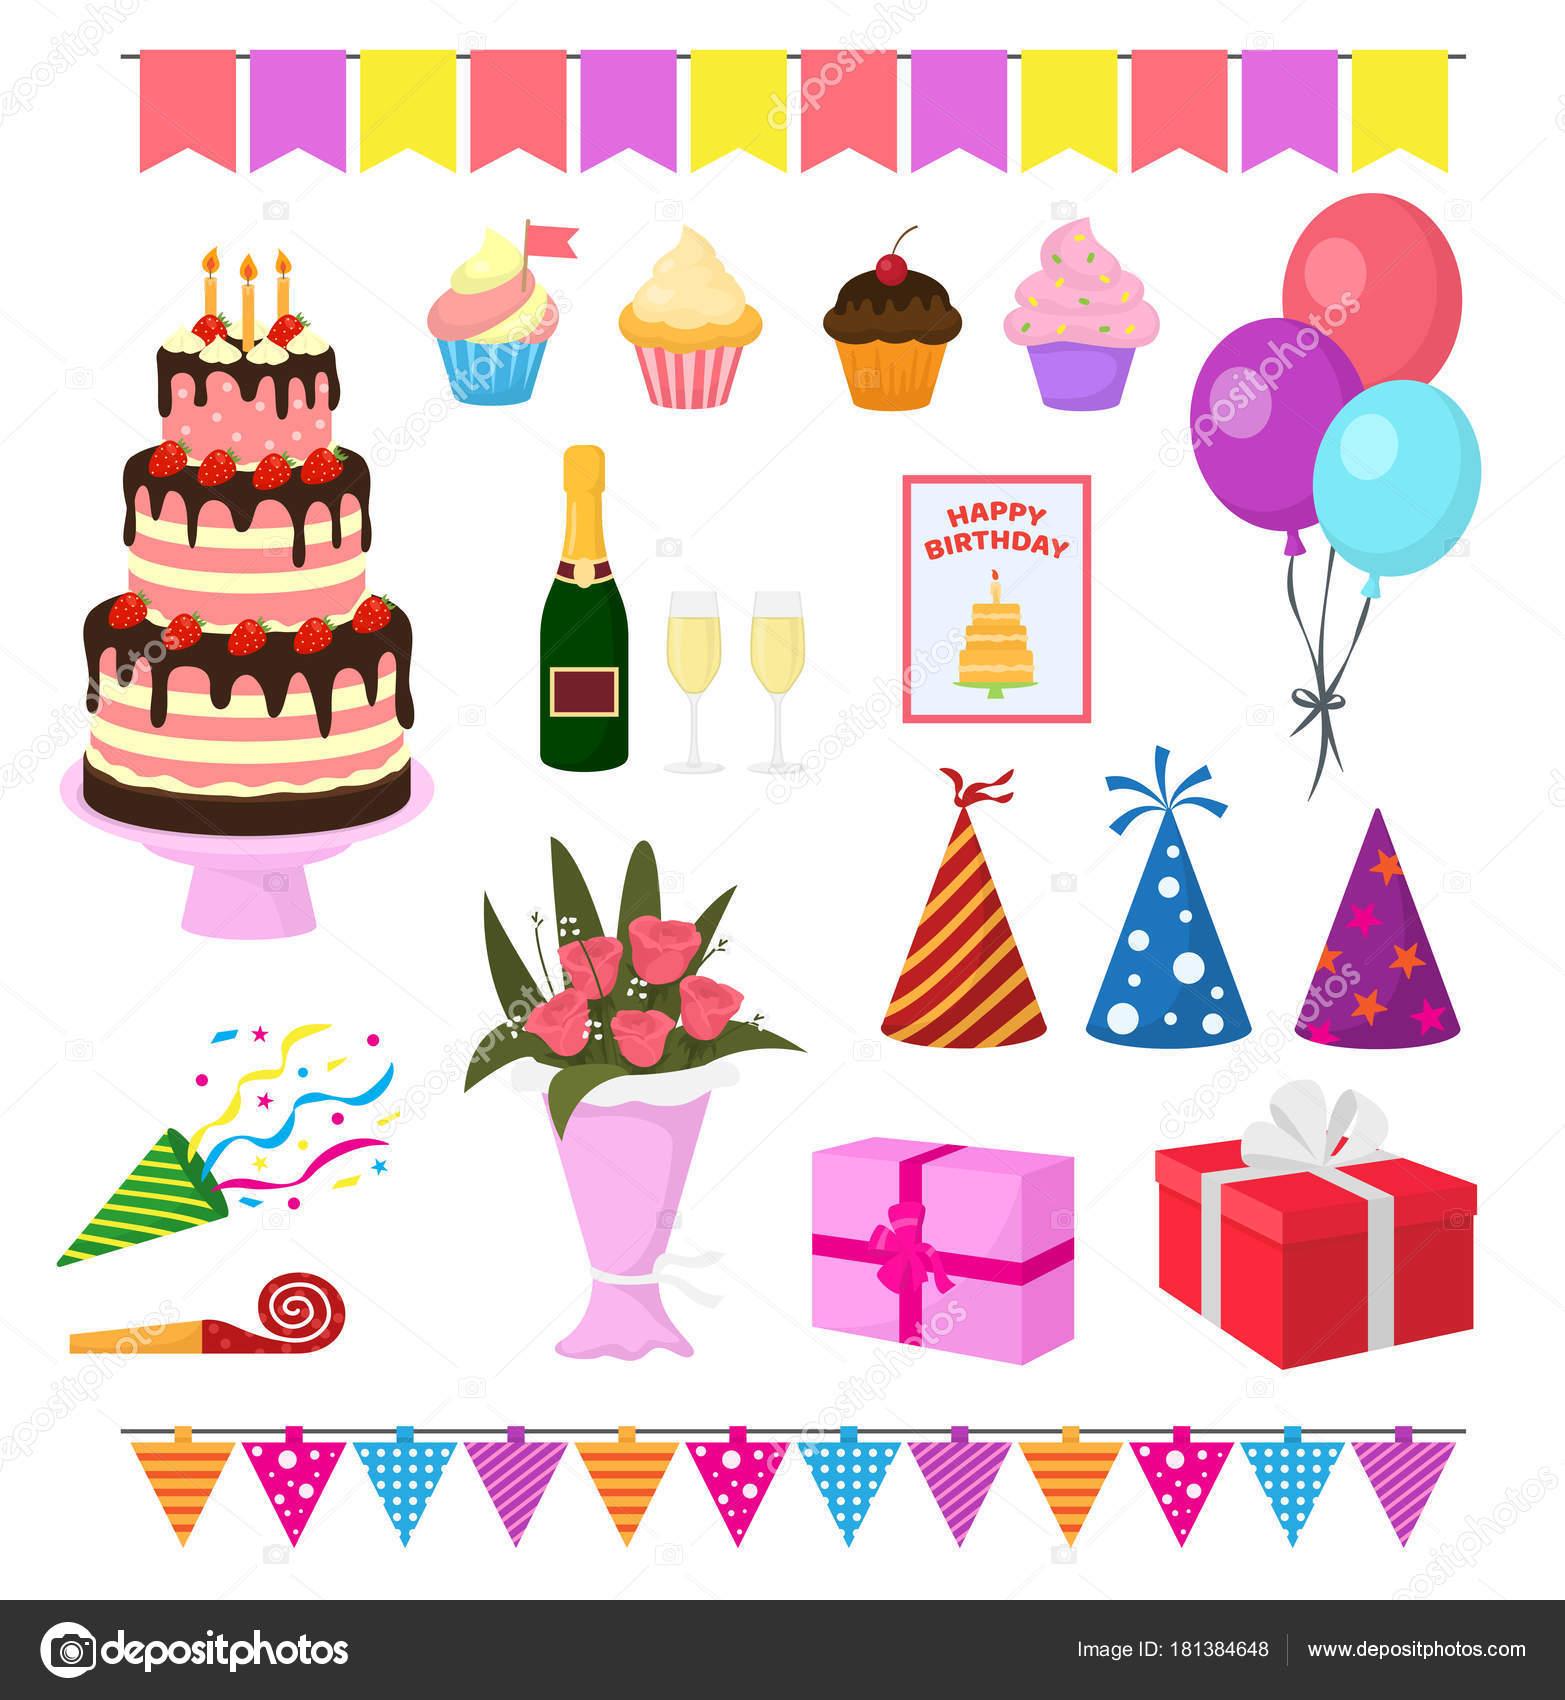 Birthday party vector anniversary cartoon kids happy birth cake or